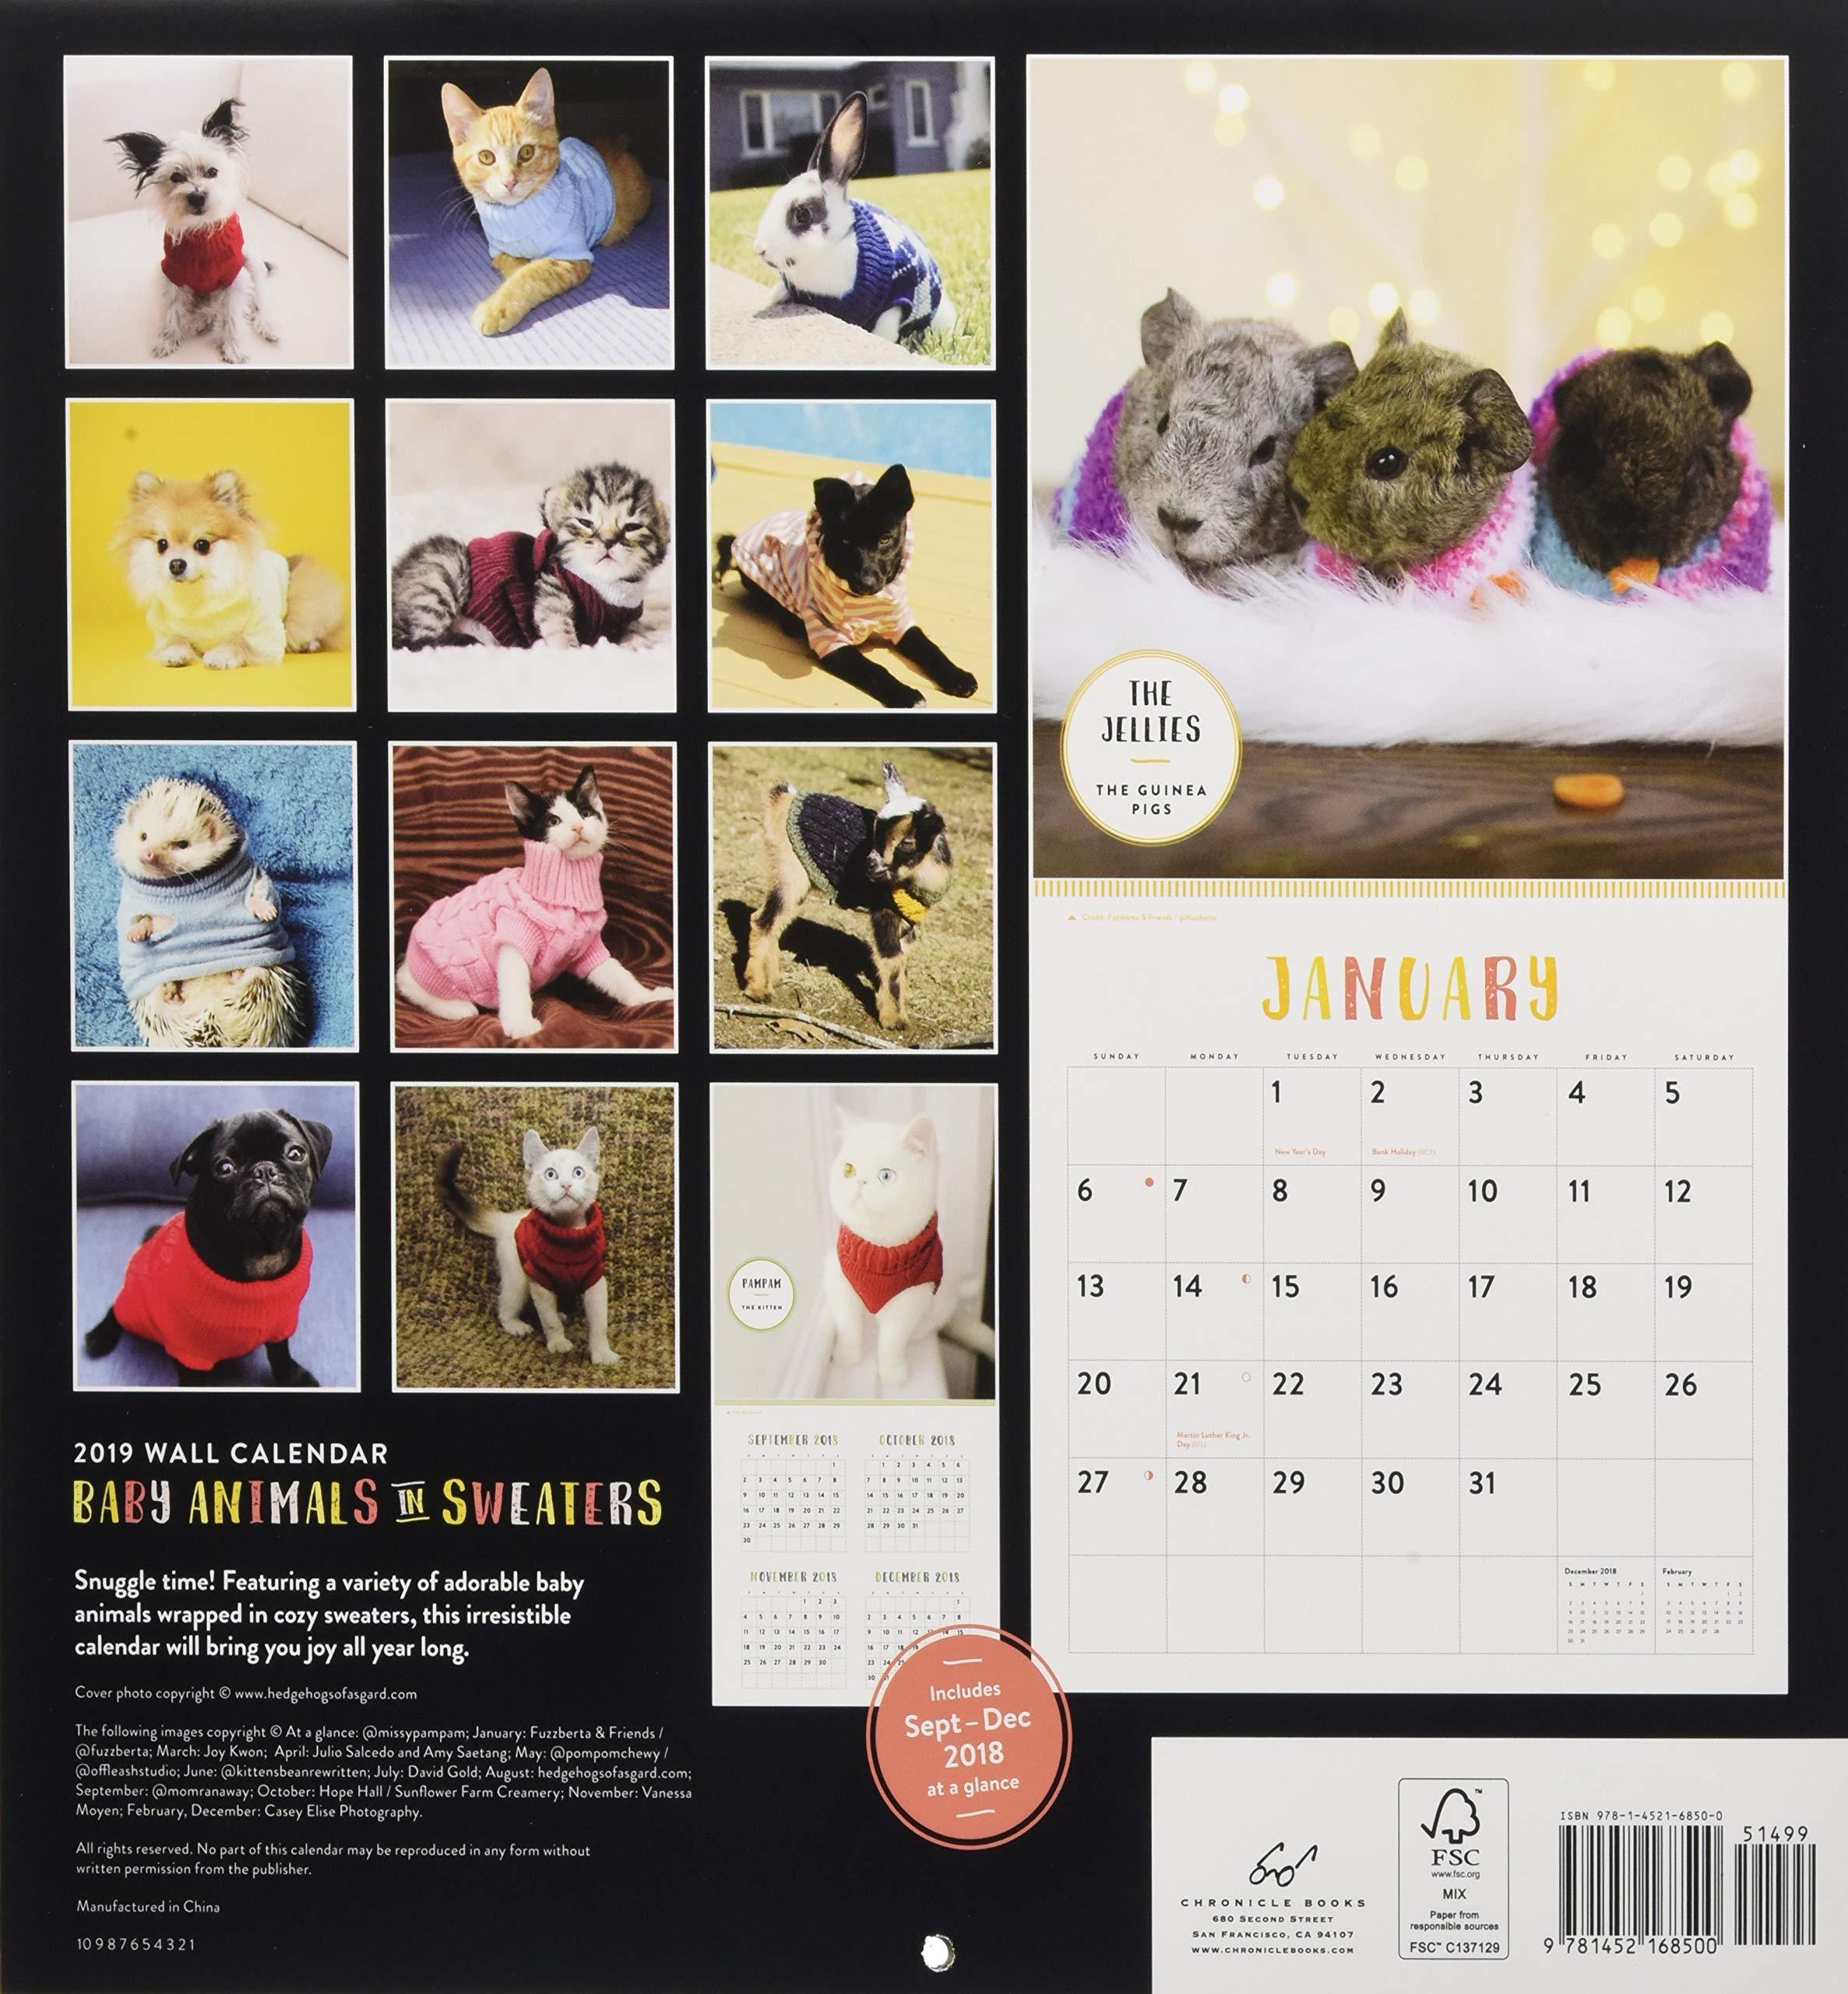 Amazon.com Baby Animals in Sweaters 2019 Wall Calendar